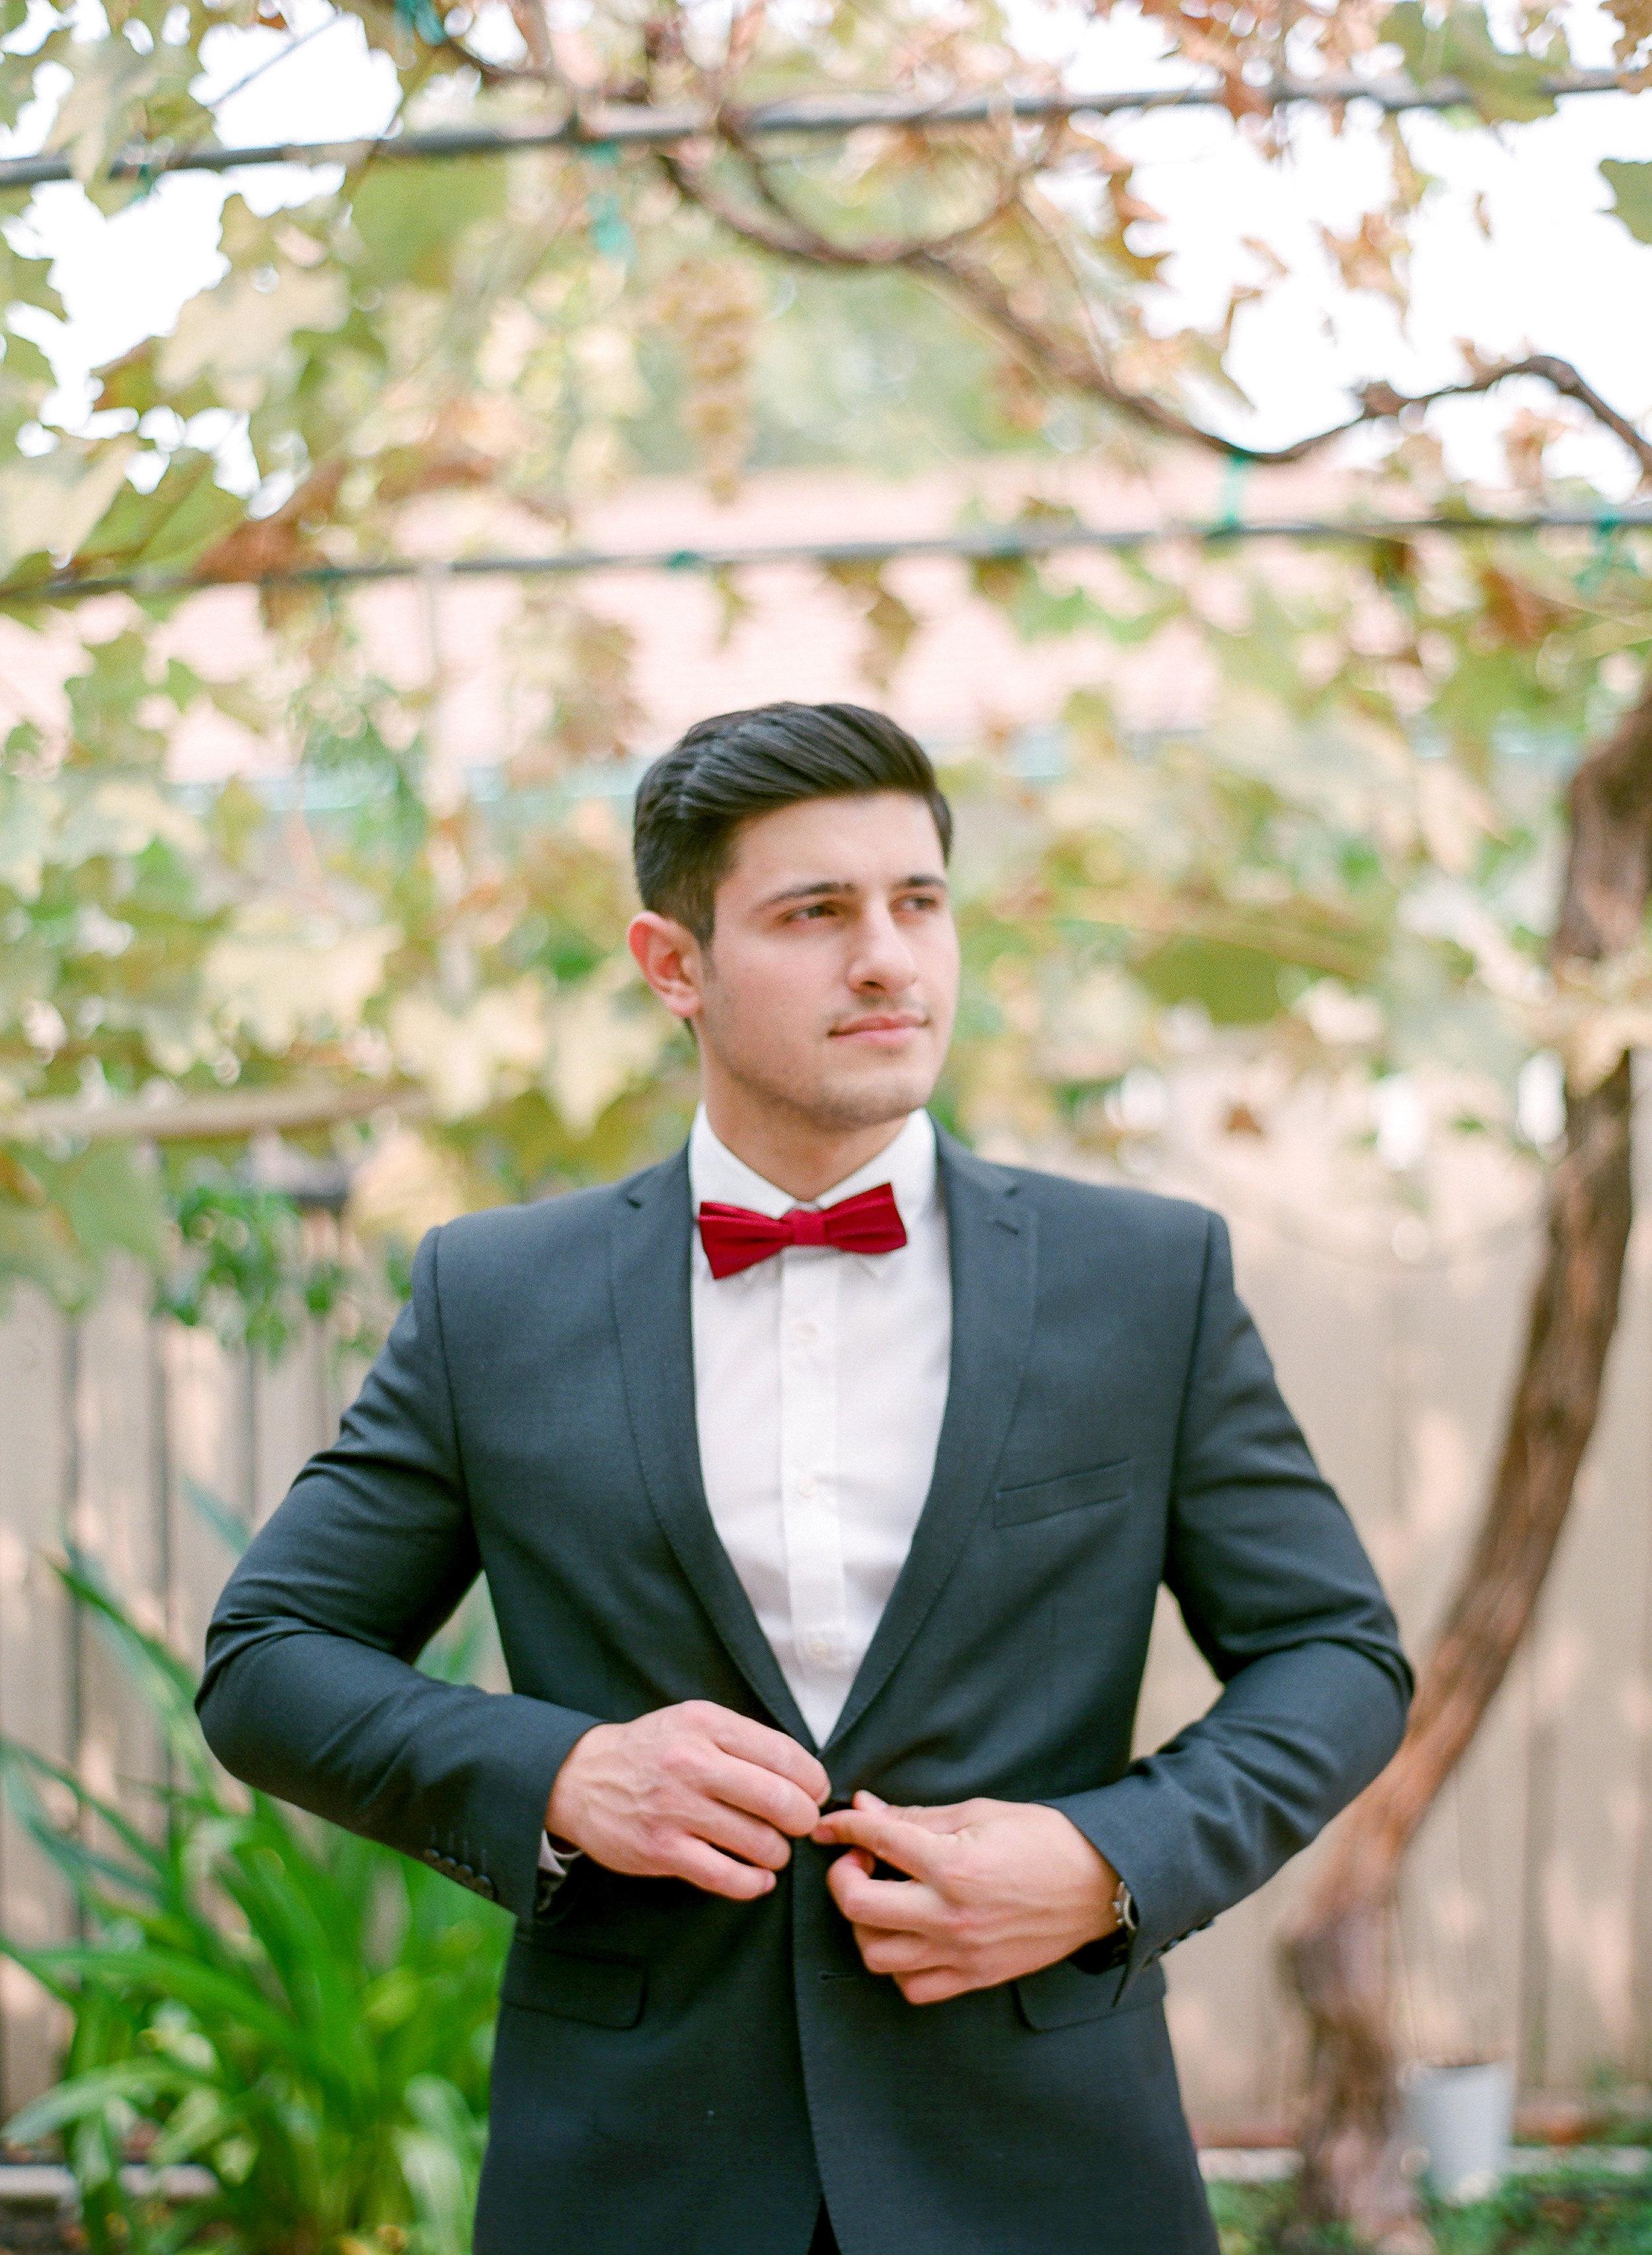 Amador_County_Wedding_Groom_Style_Rancho_Victoria_Vineyard_Northern_California.jpg